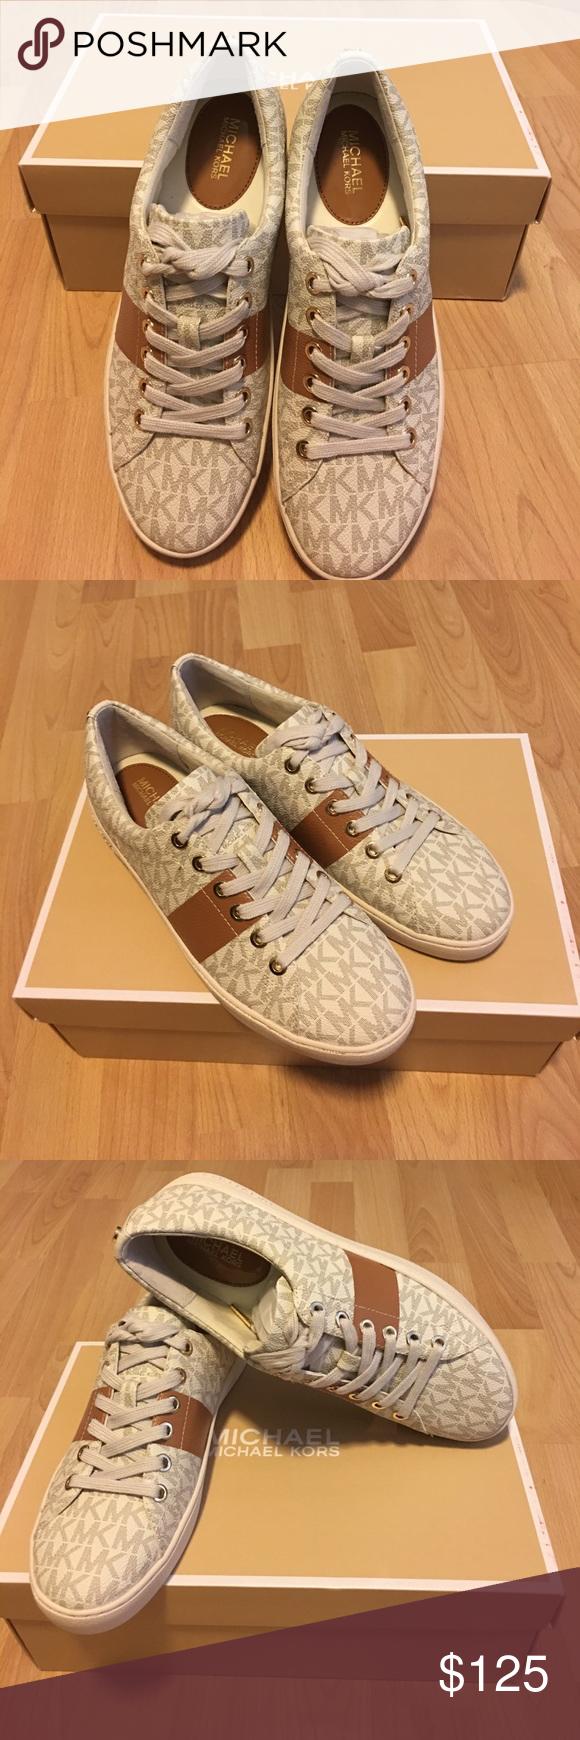 0cf2ea44b50 Michael Kors Keaton Lace Up Sneakers Michael Kors Keaton Lace Up Mini MK  Logo PVC . Vanilla/ Acorn Michael Kors Shoes Sneakers